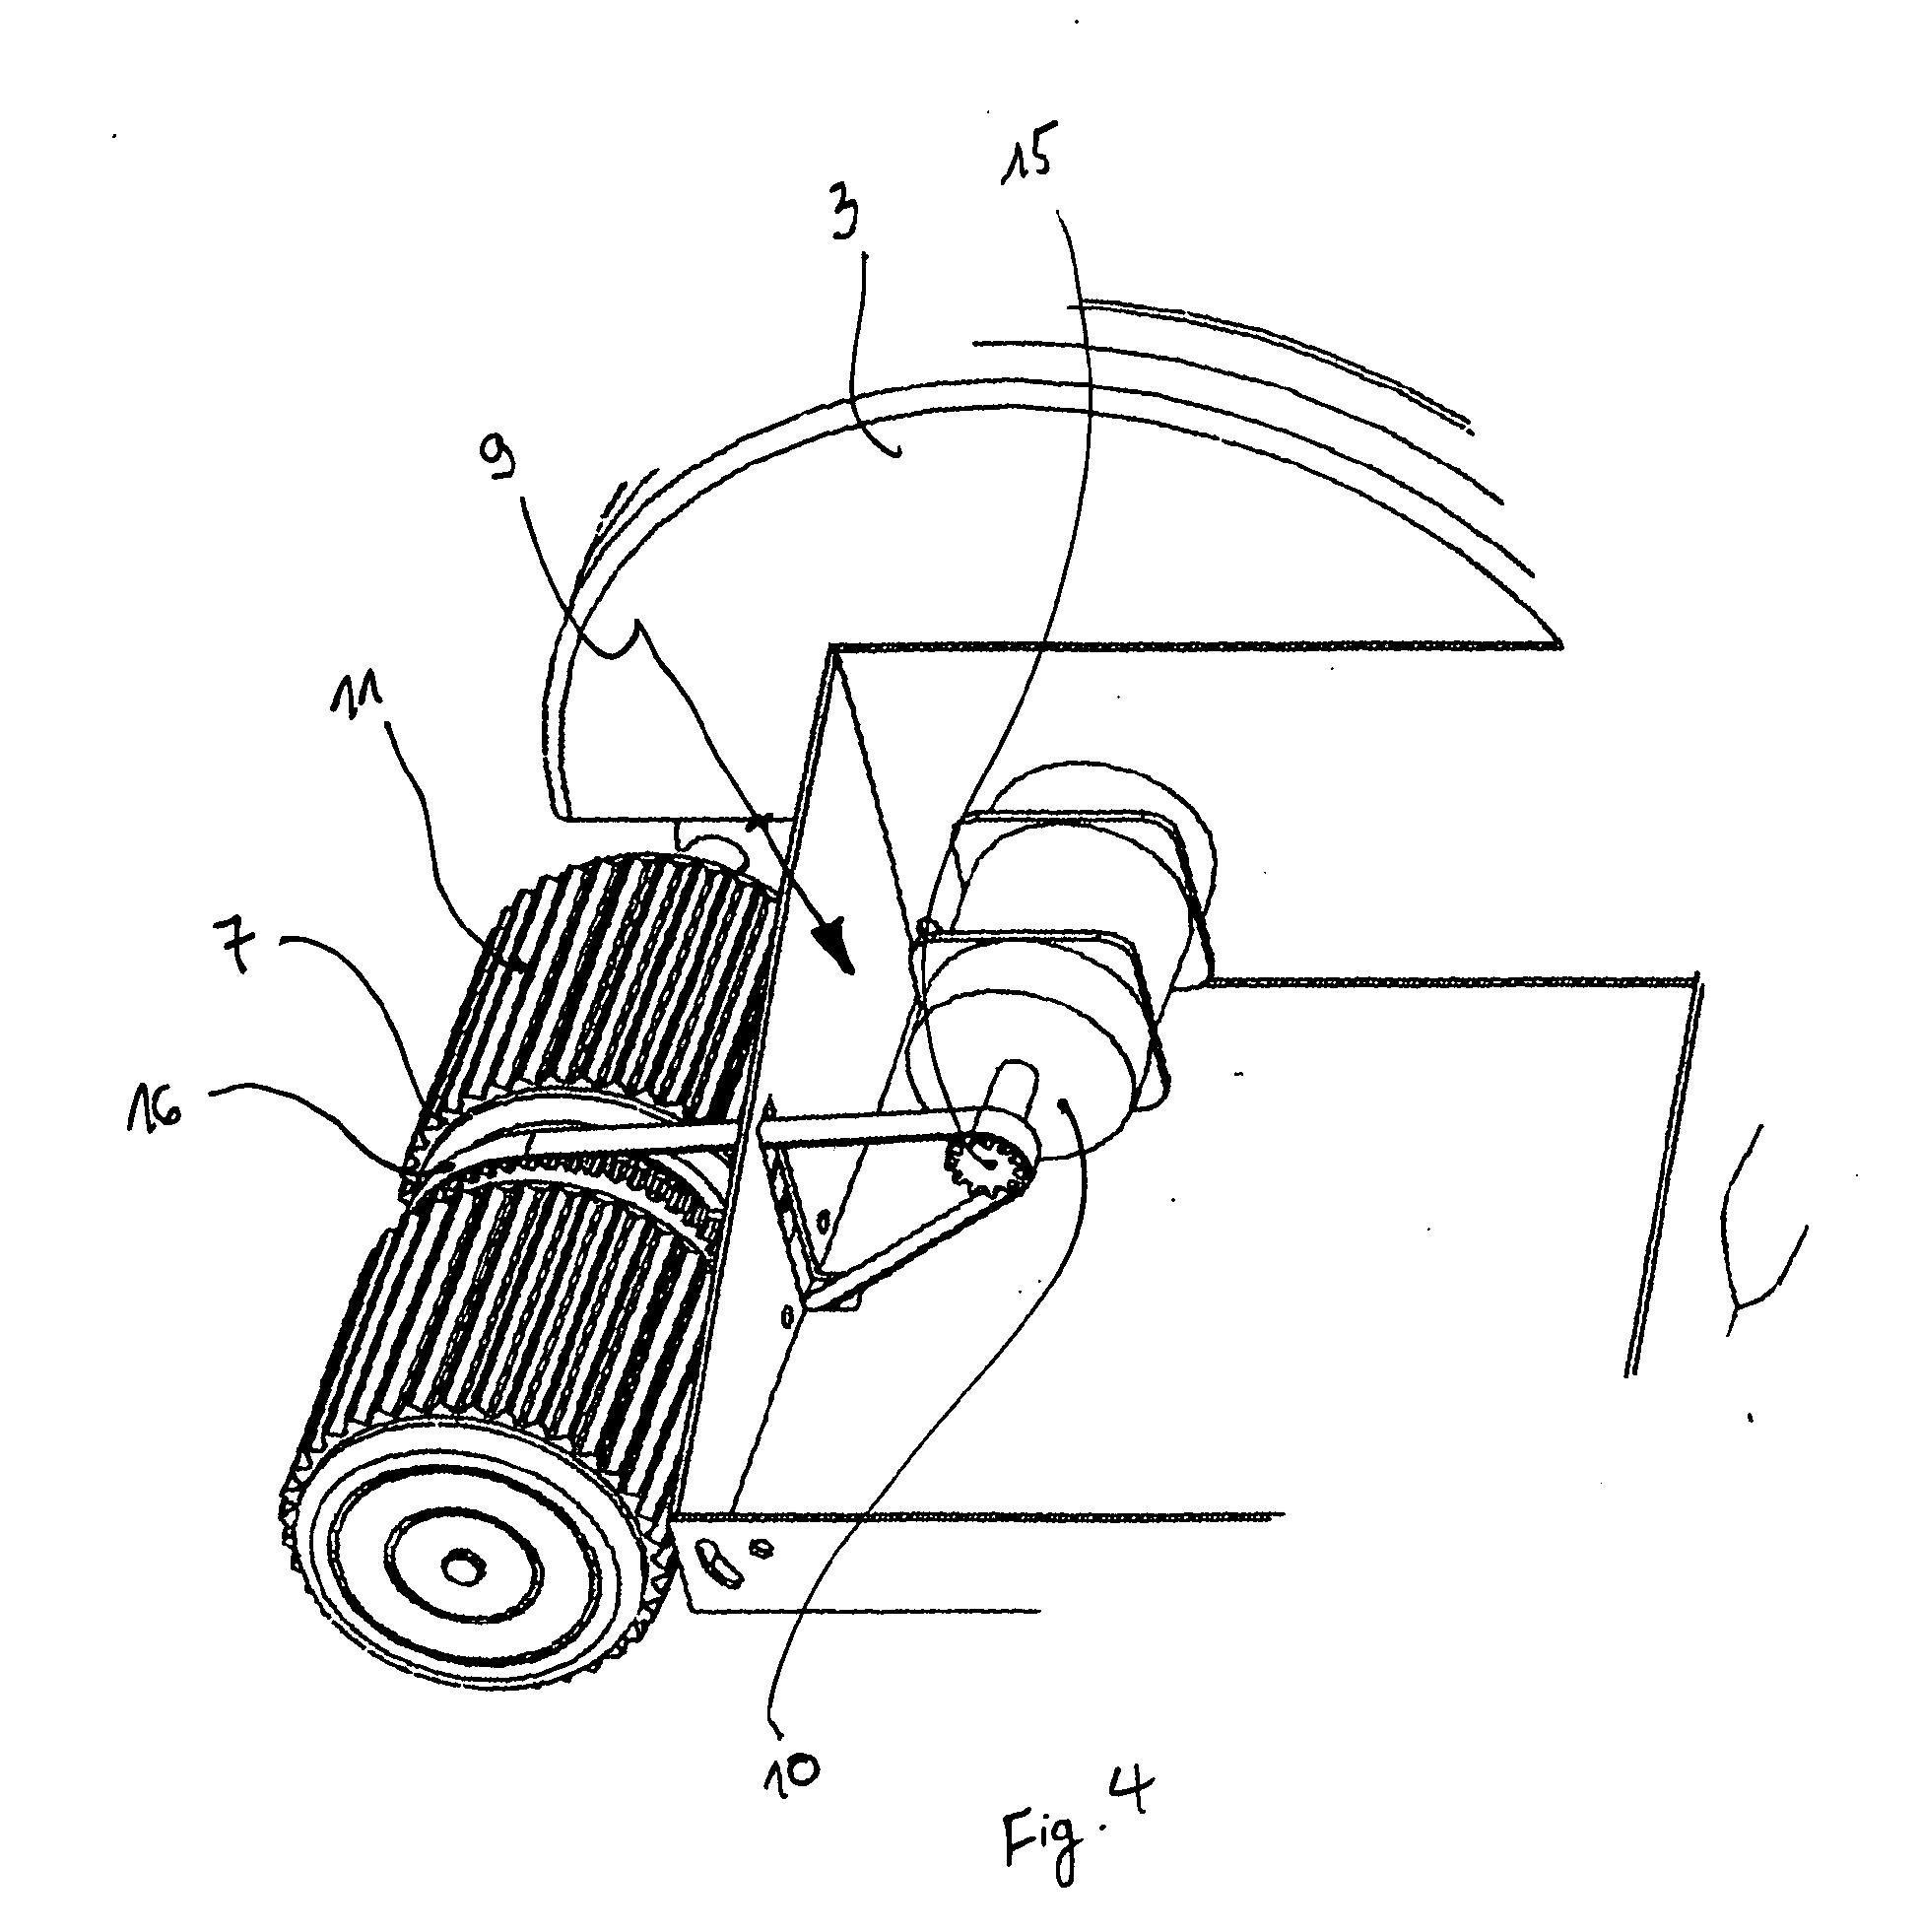 patent ep1616473a1 rasenkantenschneider google patents. Black Bedroom Furniture Sets. Home Design Ideas